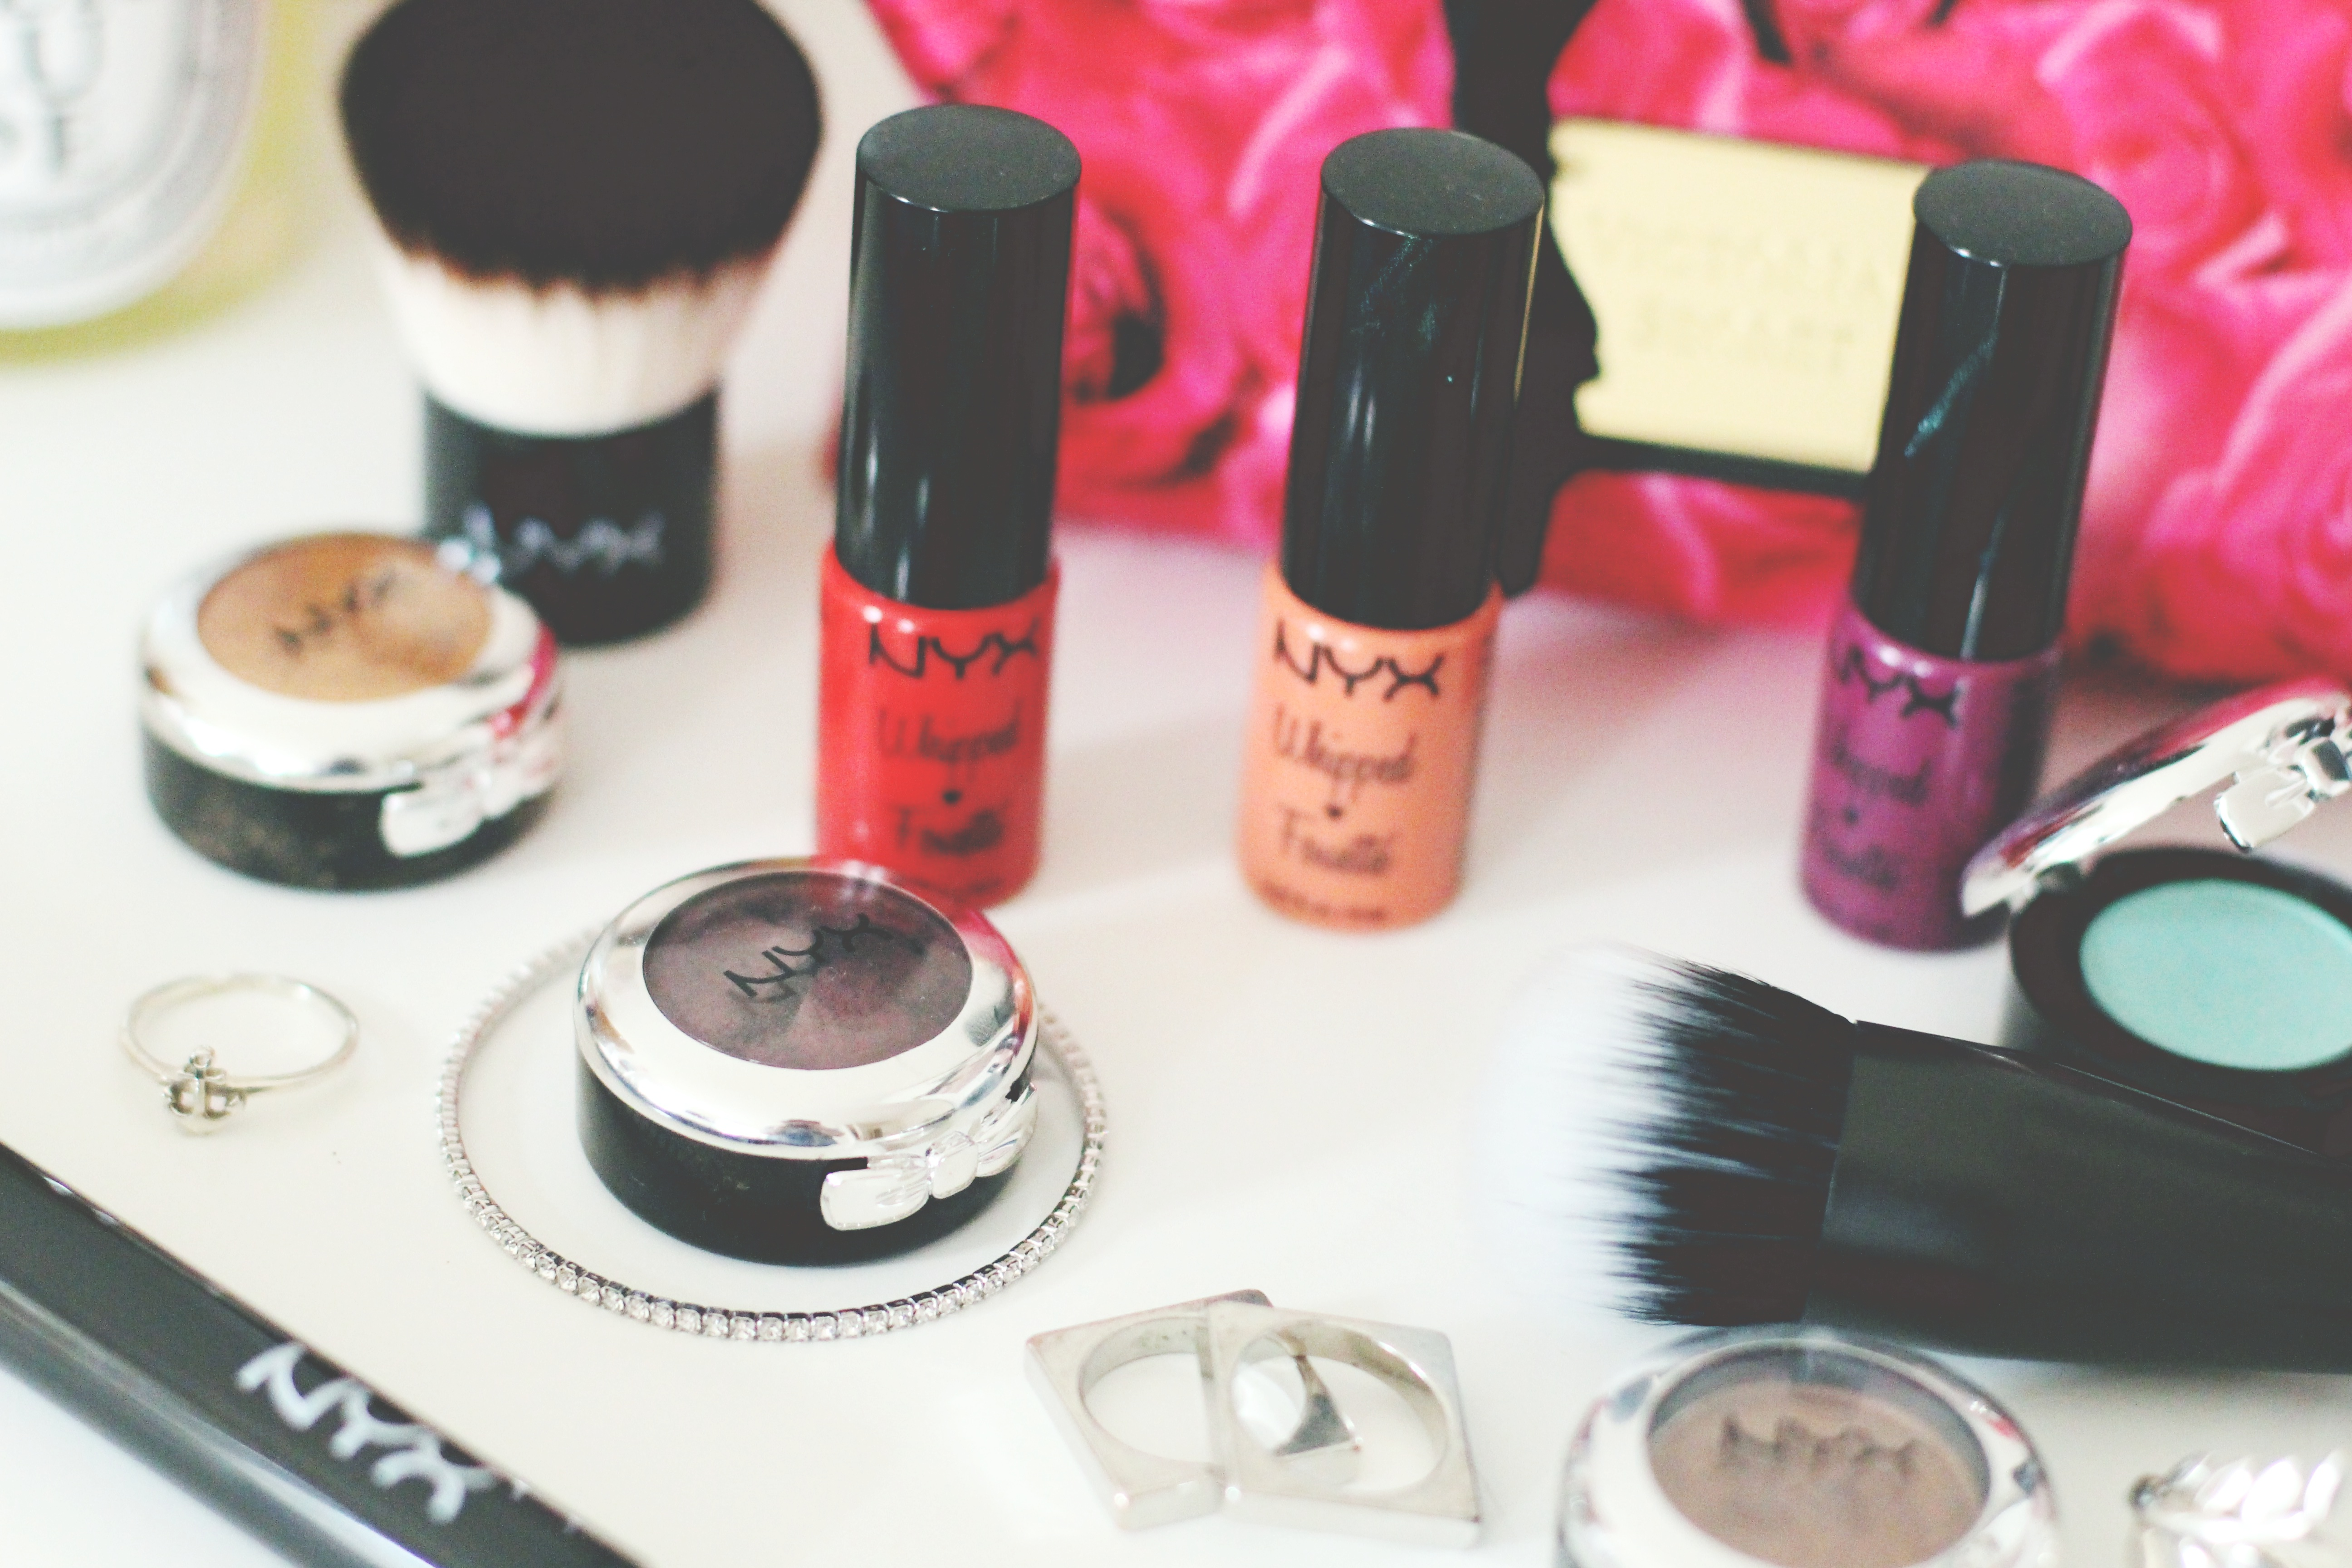 nyx cosmetics nouveautés